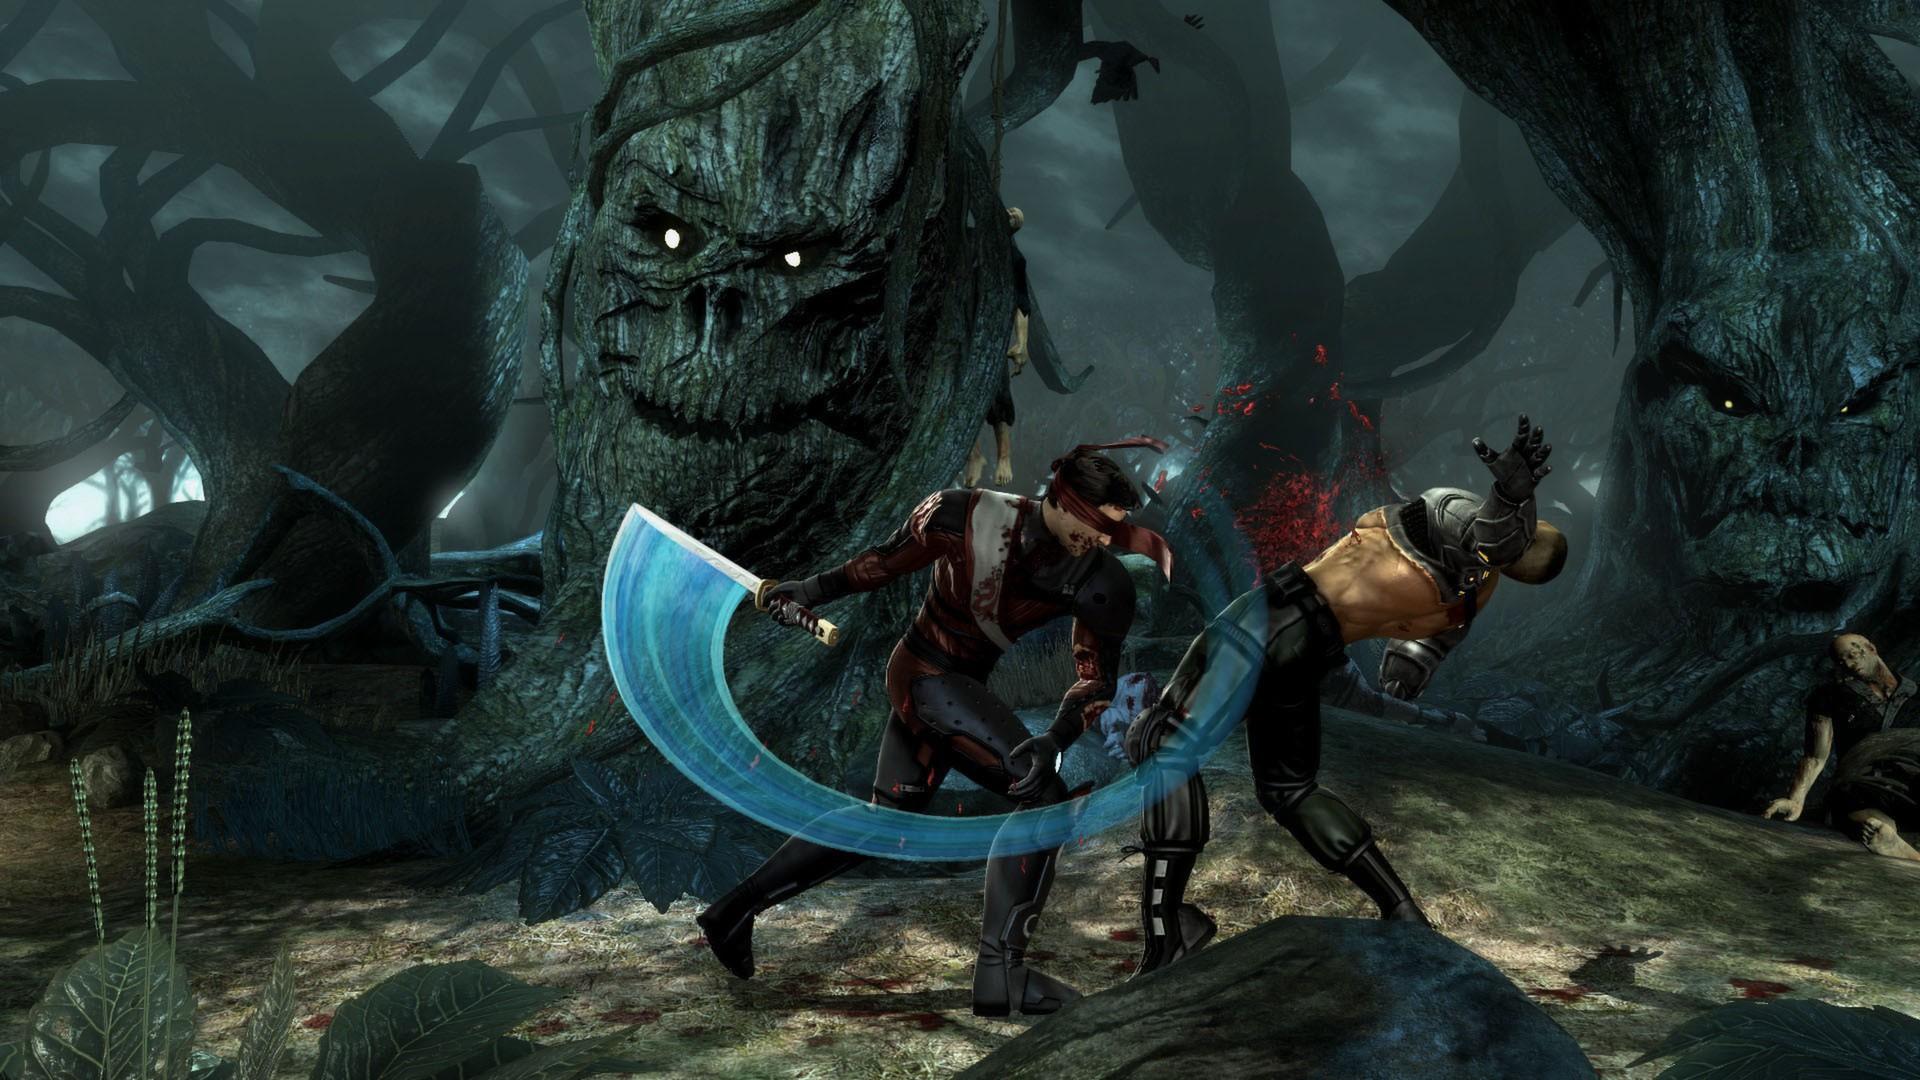 Mortal Kombat 9 Dlc Characters Free Download Ps3 - bloggerbertyl